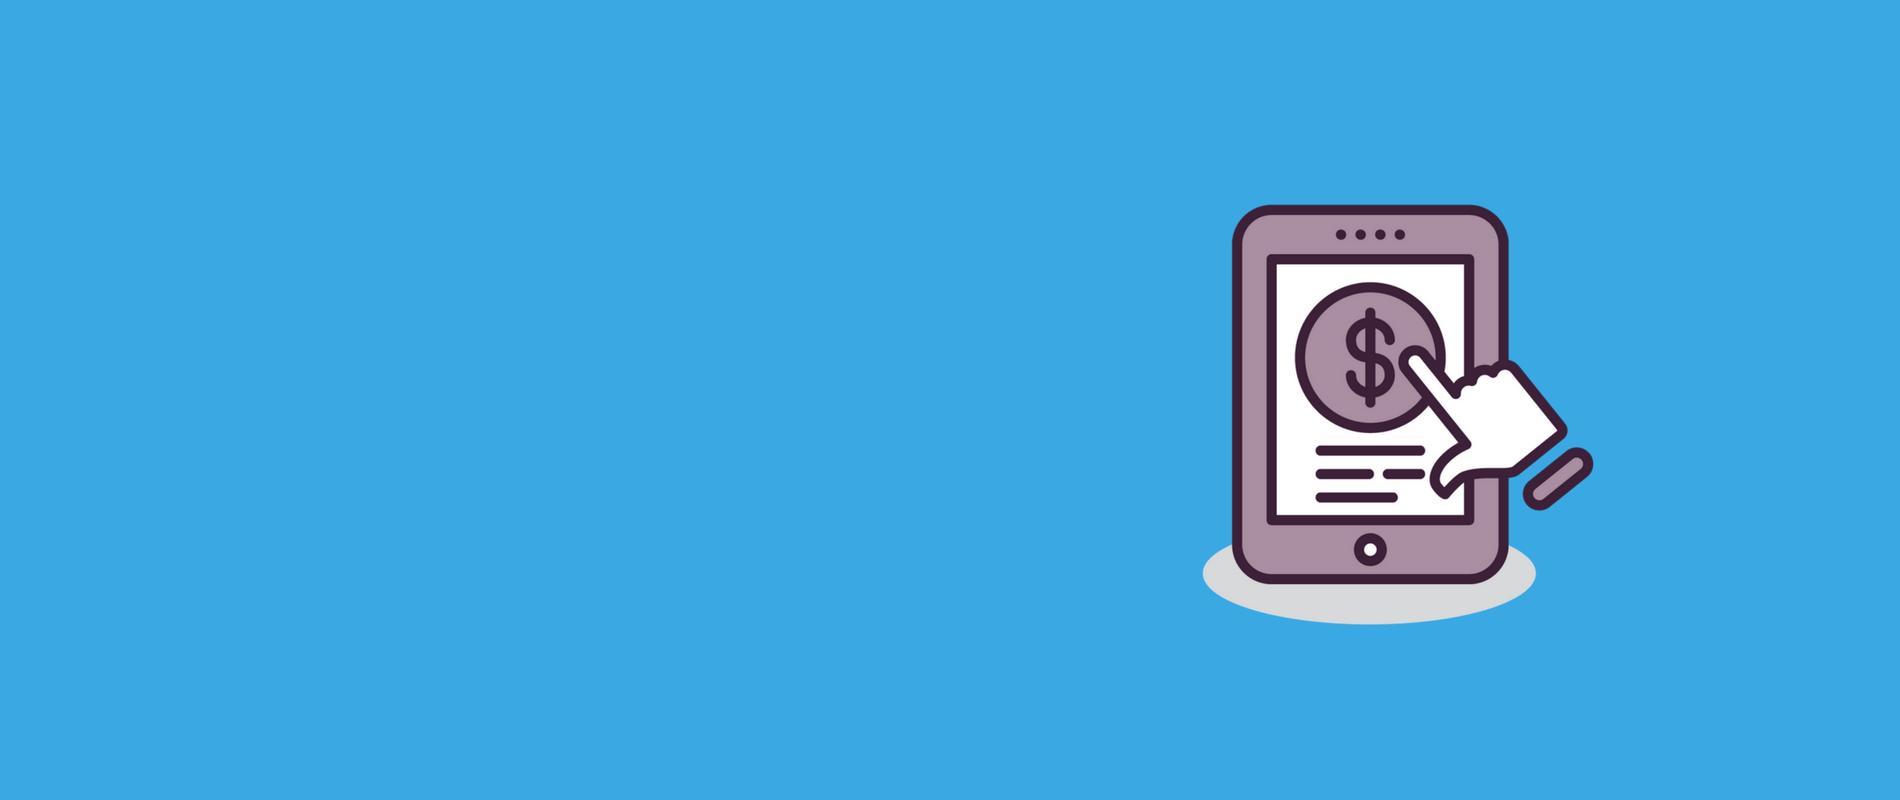 Make Money Free Cash App Download